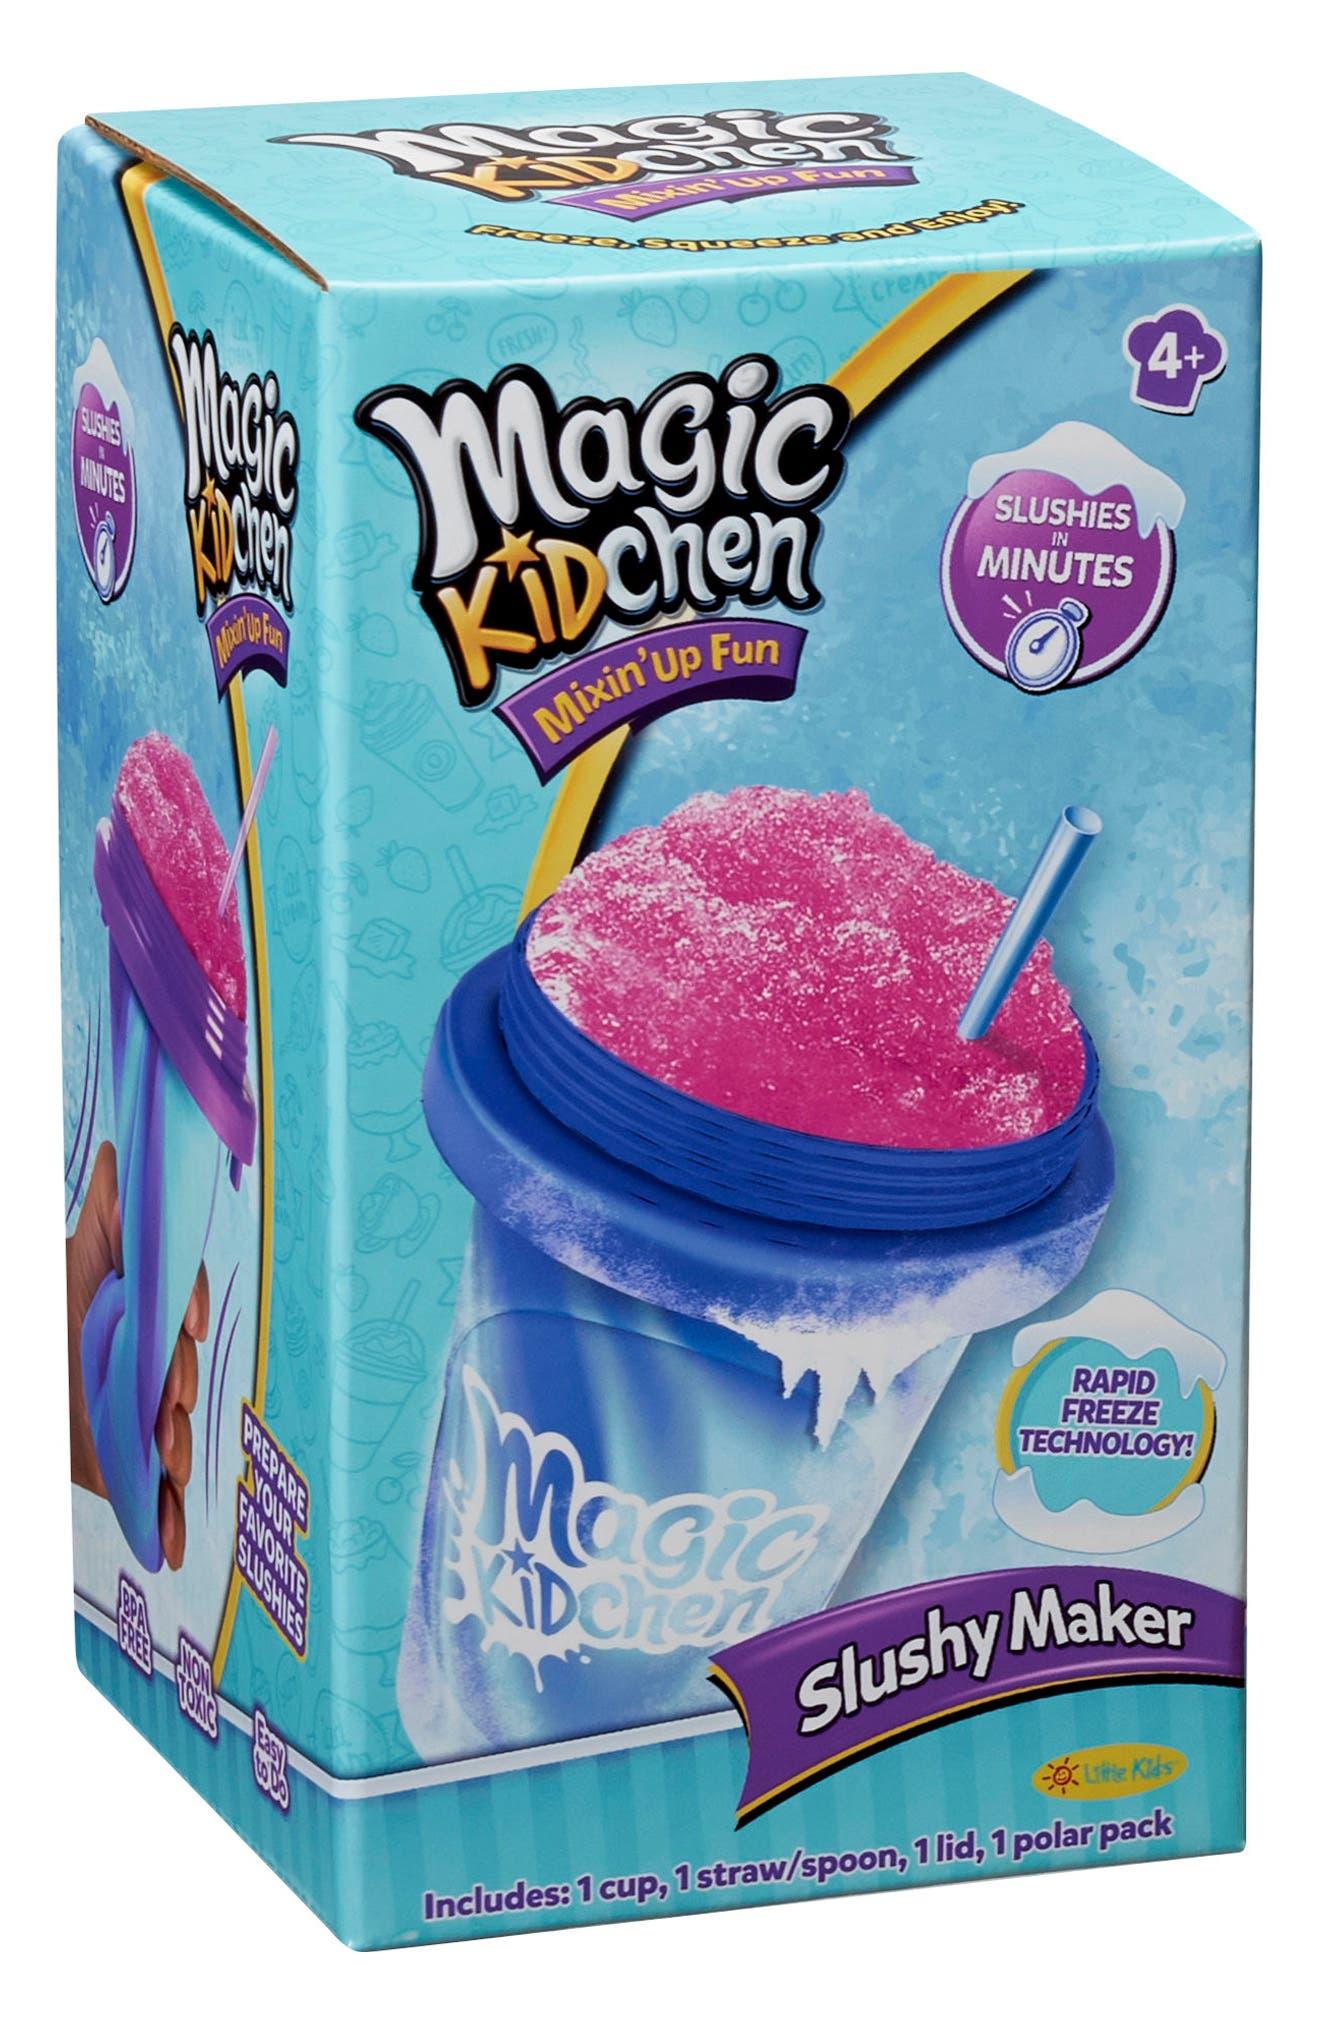 Magic Kidchen Slushy Maker,                             Main thumbnail 1, color,                             600